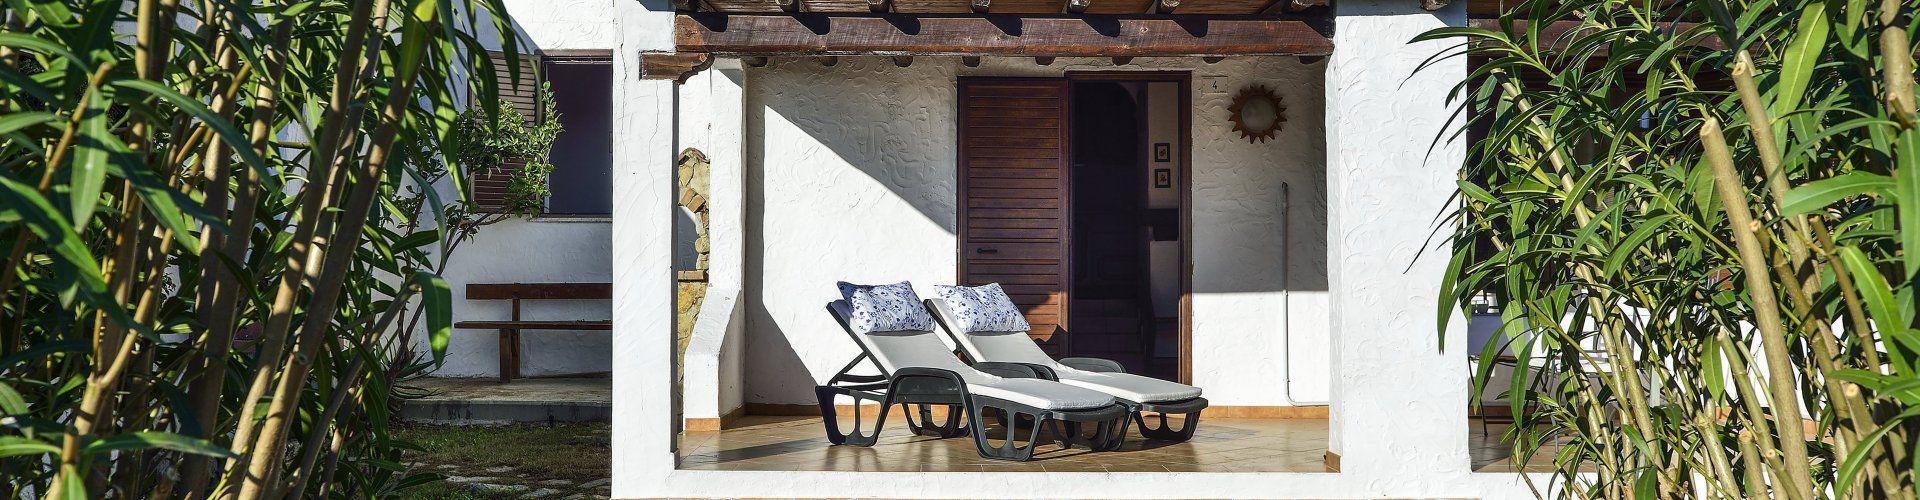 Villa in Strandnähe an der Costa Rei